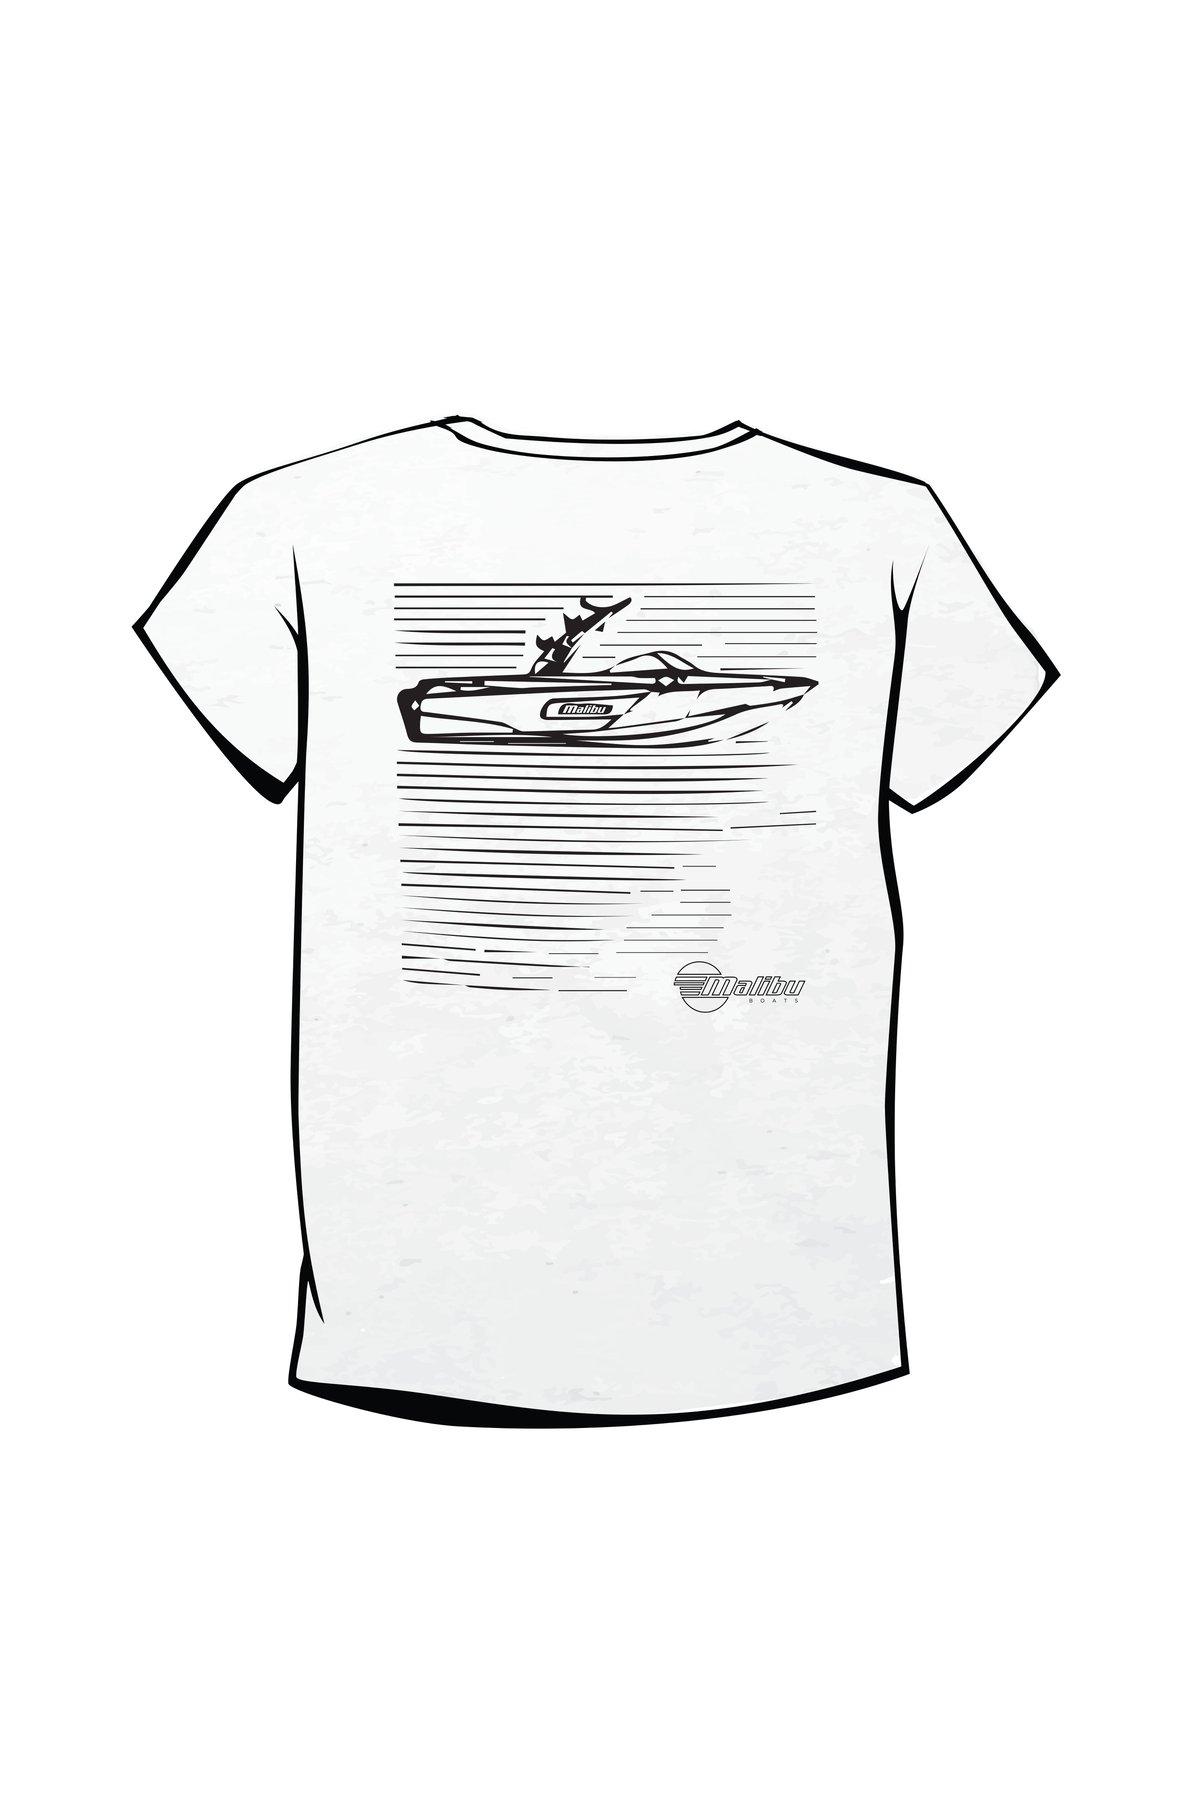 Image of Women's Summer T-shirt - Precious Stone